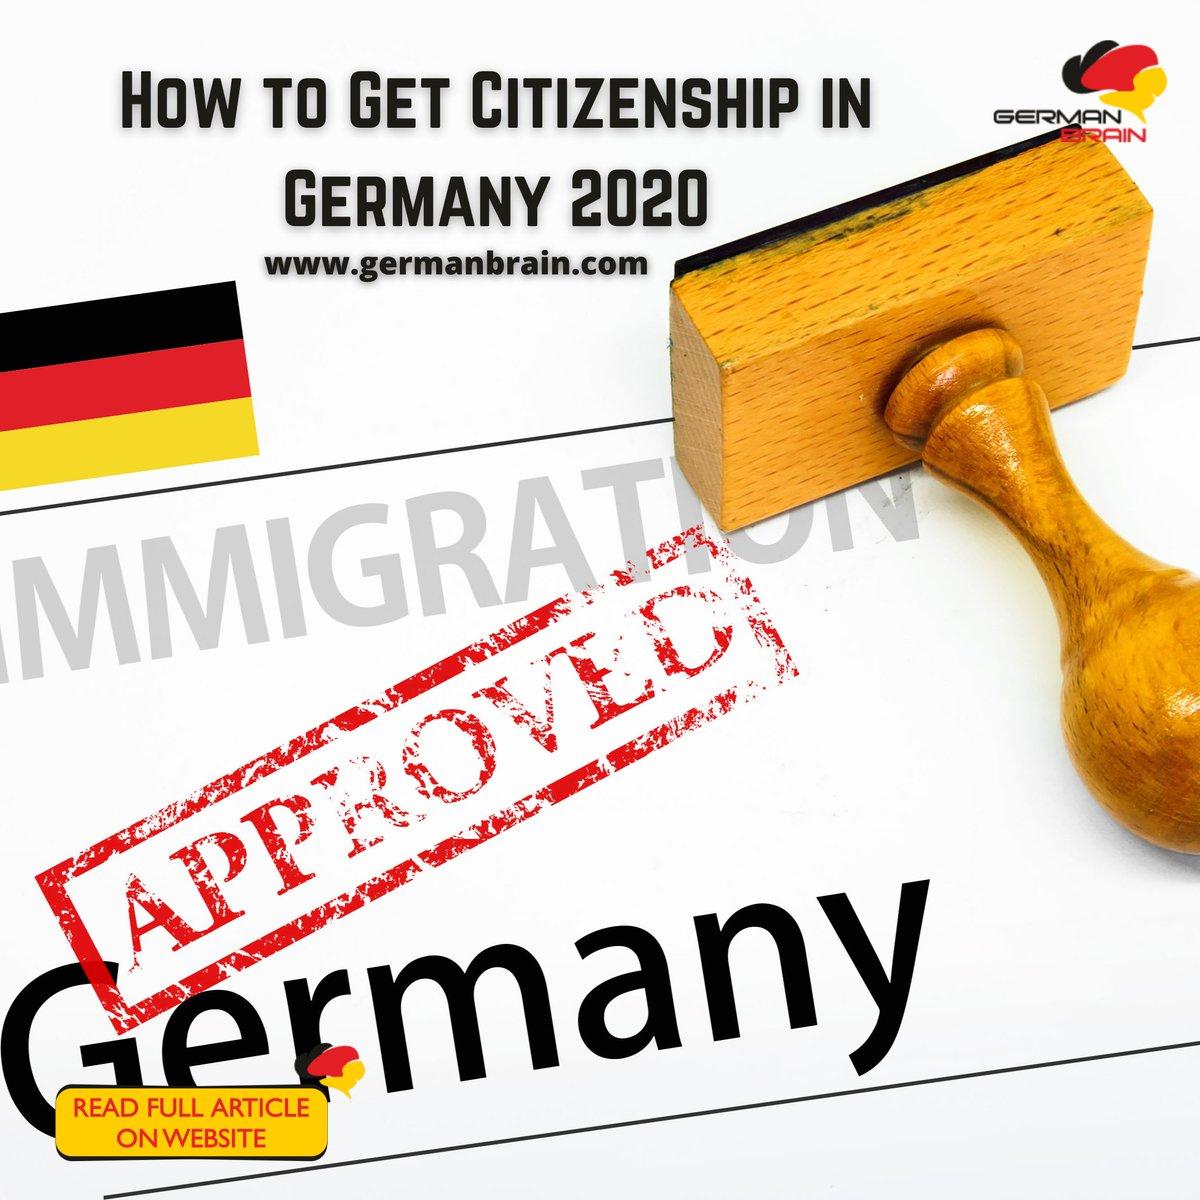 https://t.co/qIl5Xo1dea 🧐  #germany #deutschland #berlin #love #photography #nature #instagood #usa #france #travel #m #europe #k #italy #instagram #photooftheday #picoftheday #hamburg #like #follow #canada #spain #s #n #ig #london #russia #germancitzenship #german #citizenship https://t.co/FmsjyCqmOw